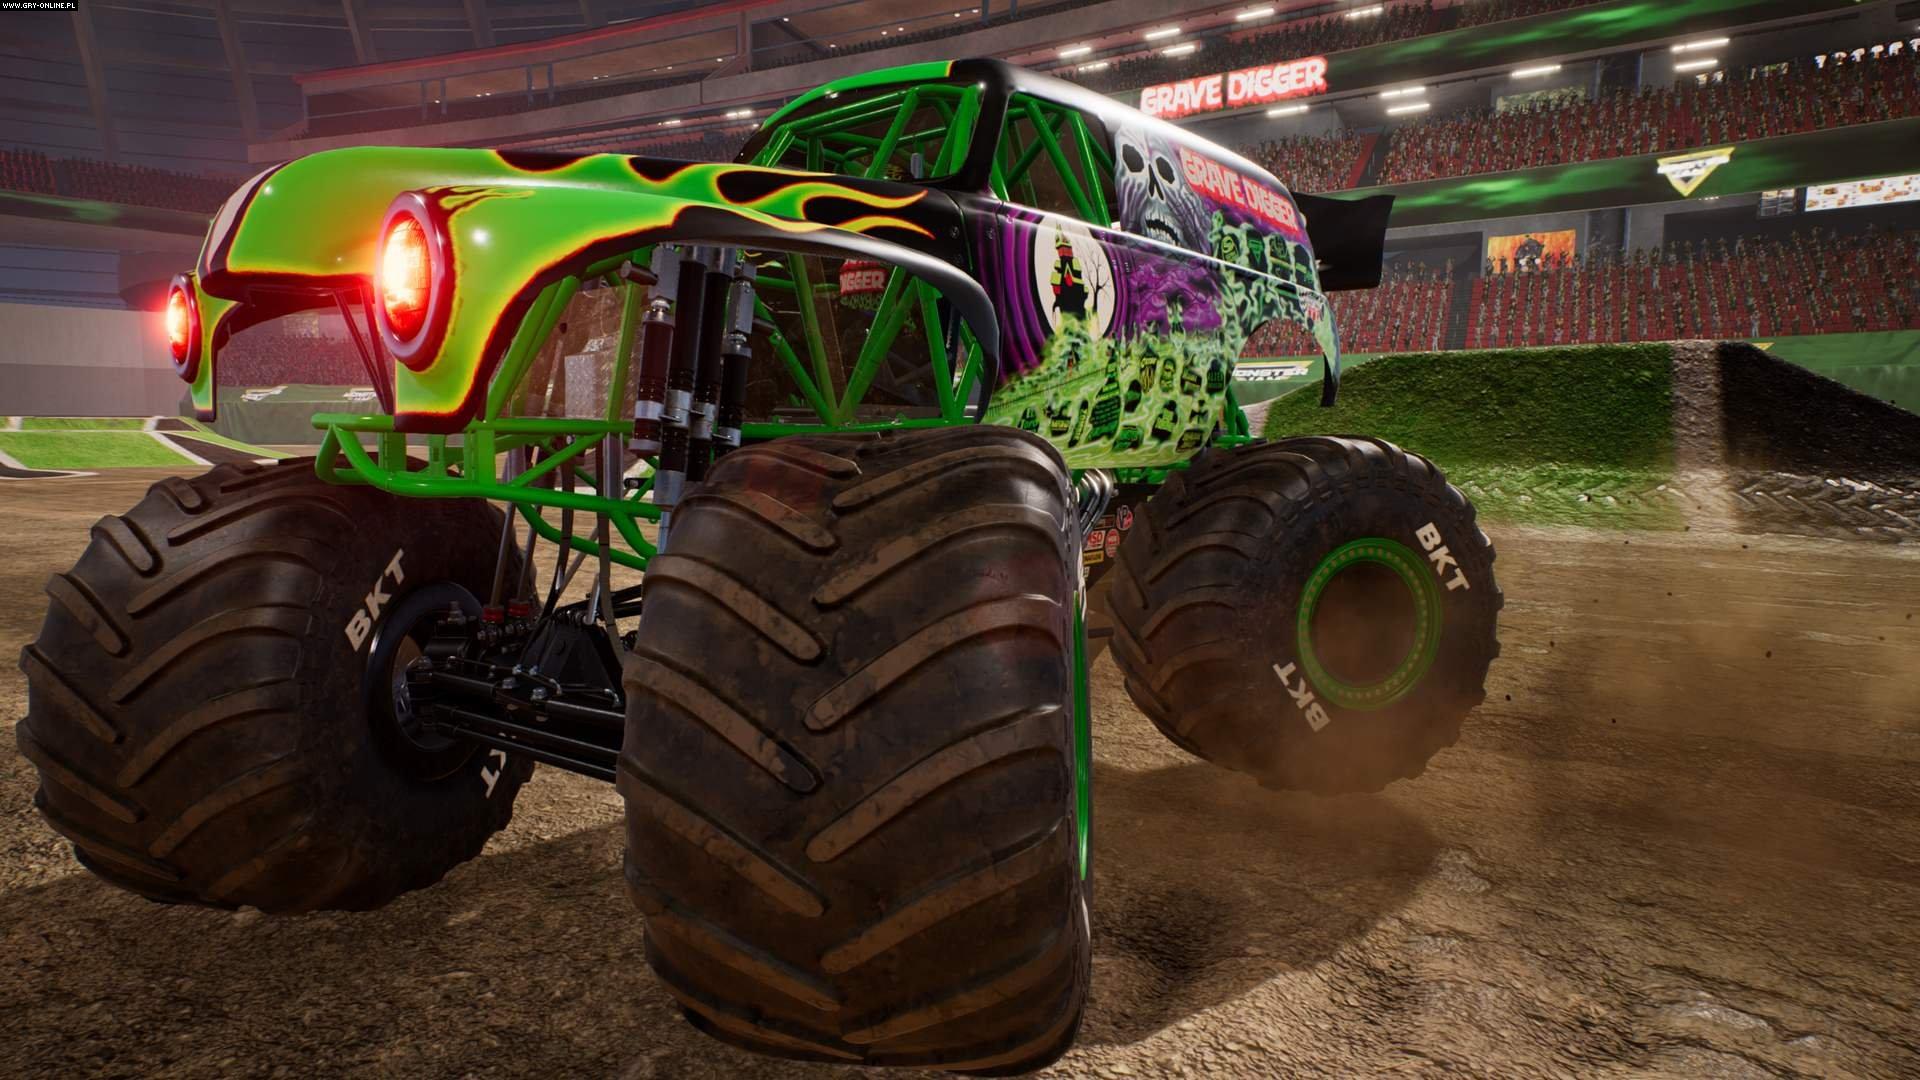 Monster Jam: Steel Titans PC, PS4, XONE Games Image 6/8, Rainbow Studios/THQ Digital Phoenix, THQ Nordic / Nordic Games